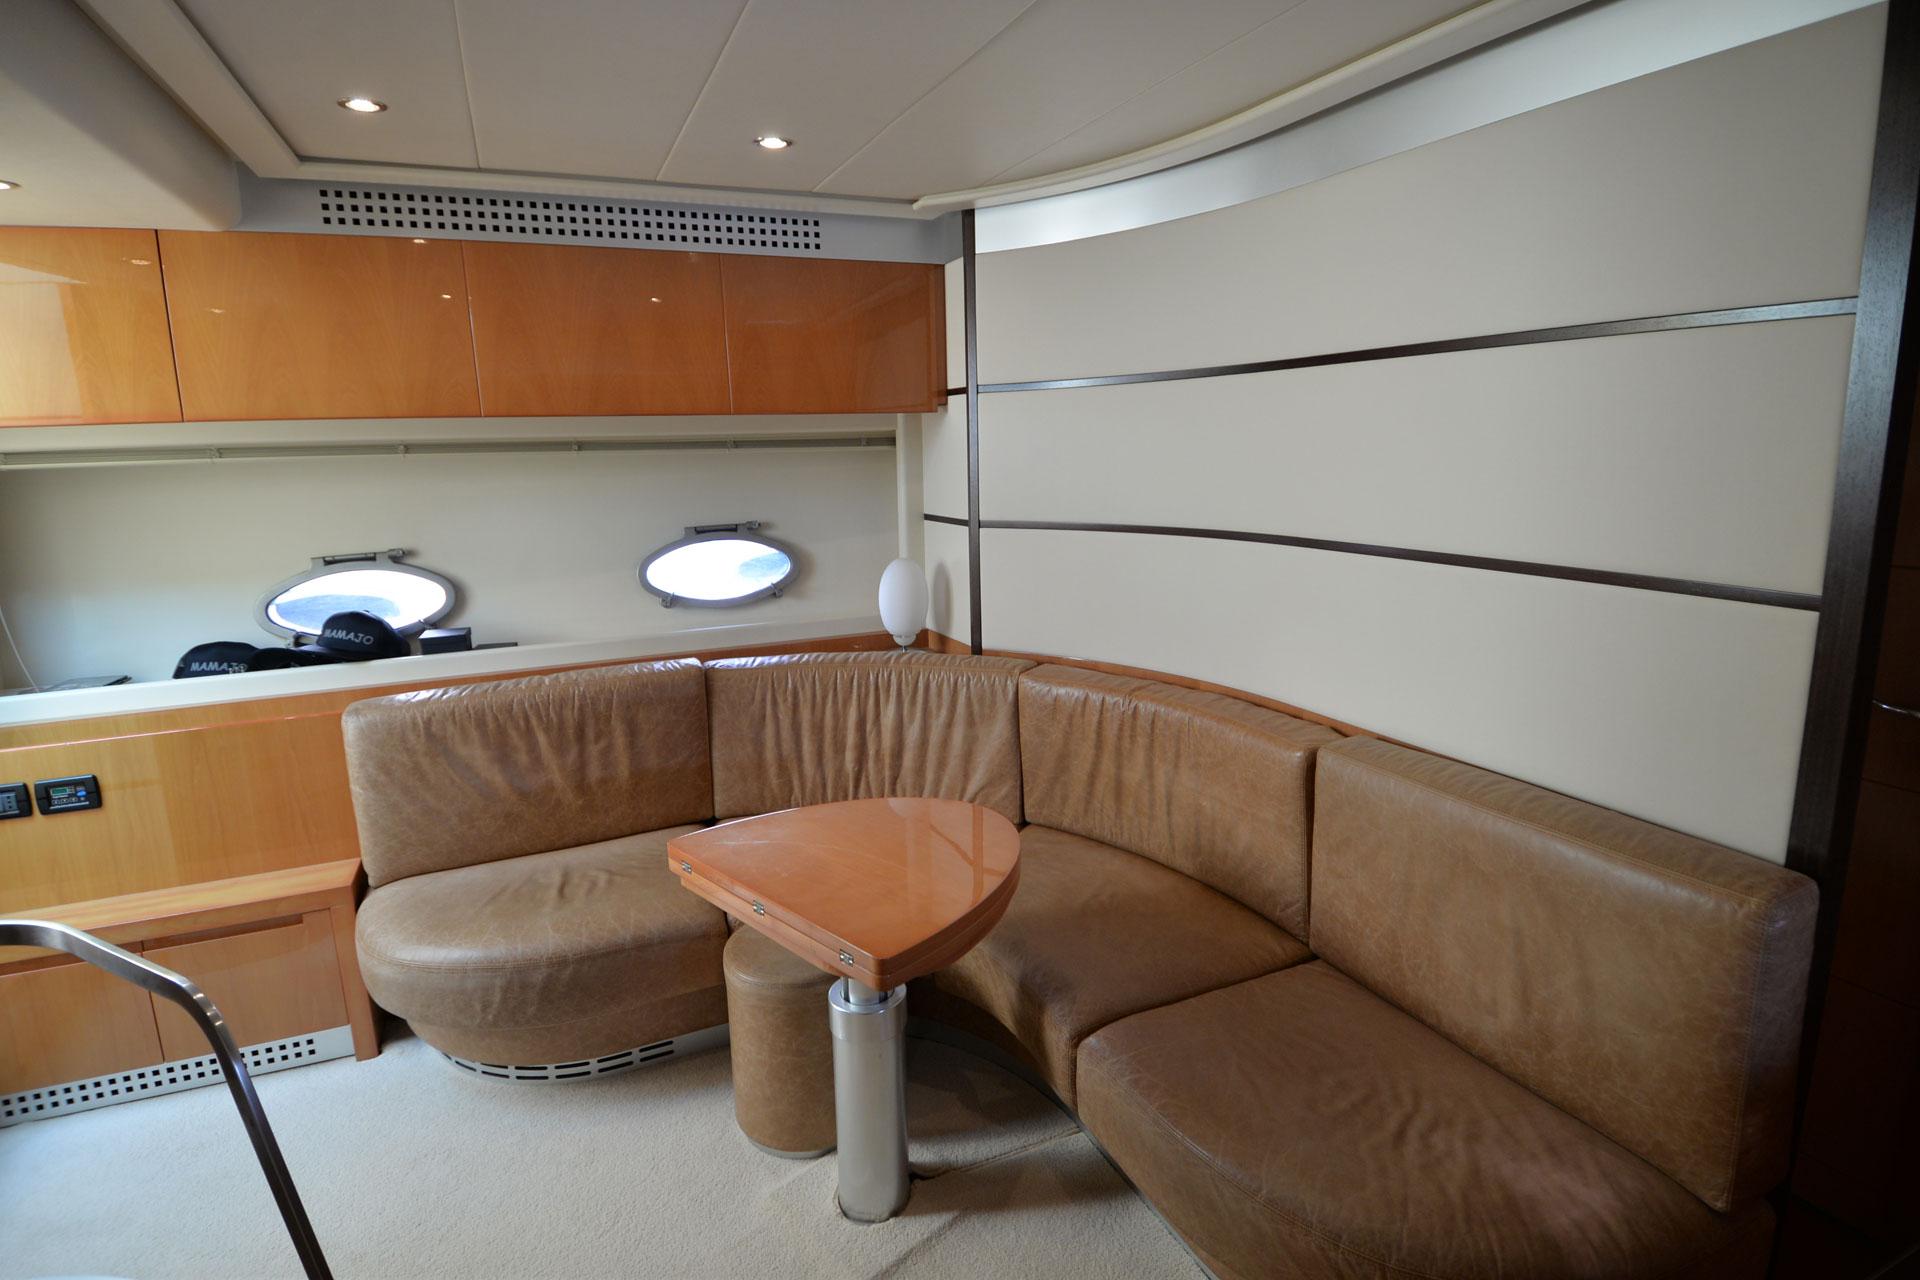 Santo-Maritime-Yachting-Pershing-Inside-Image17